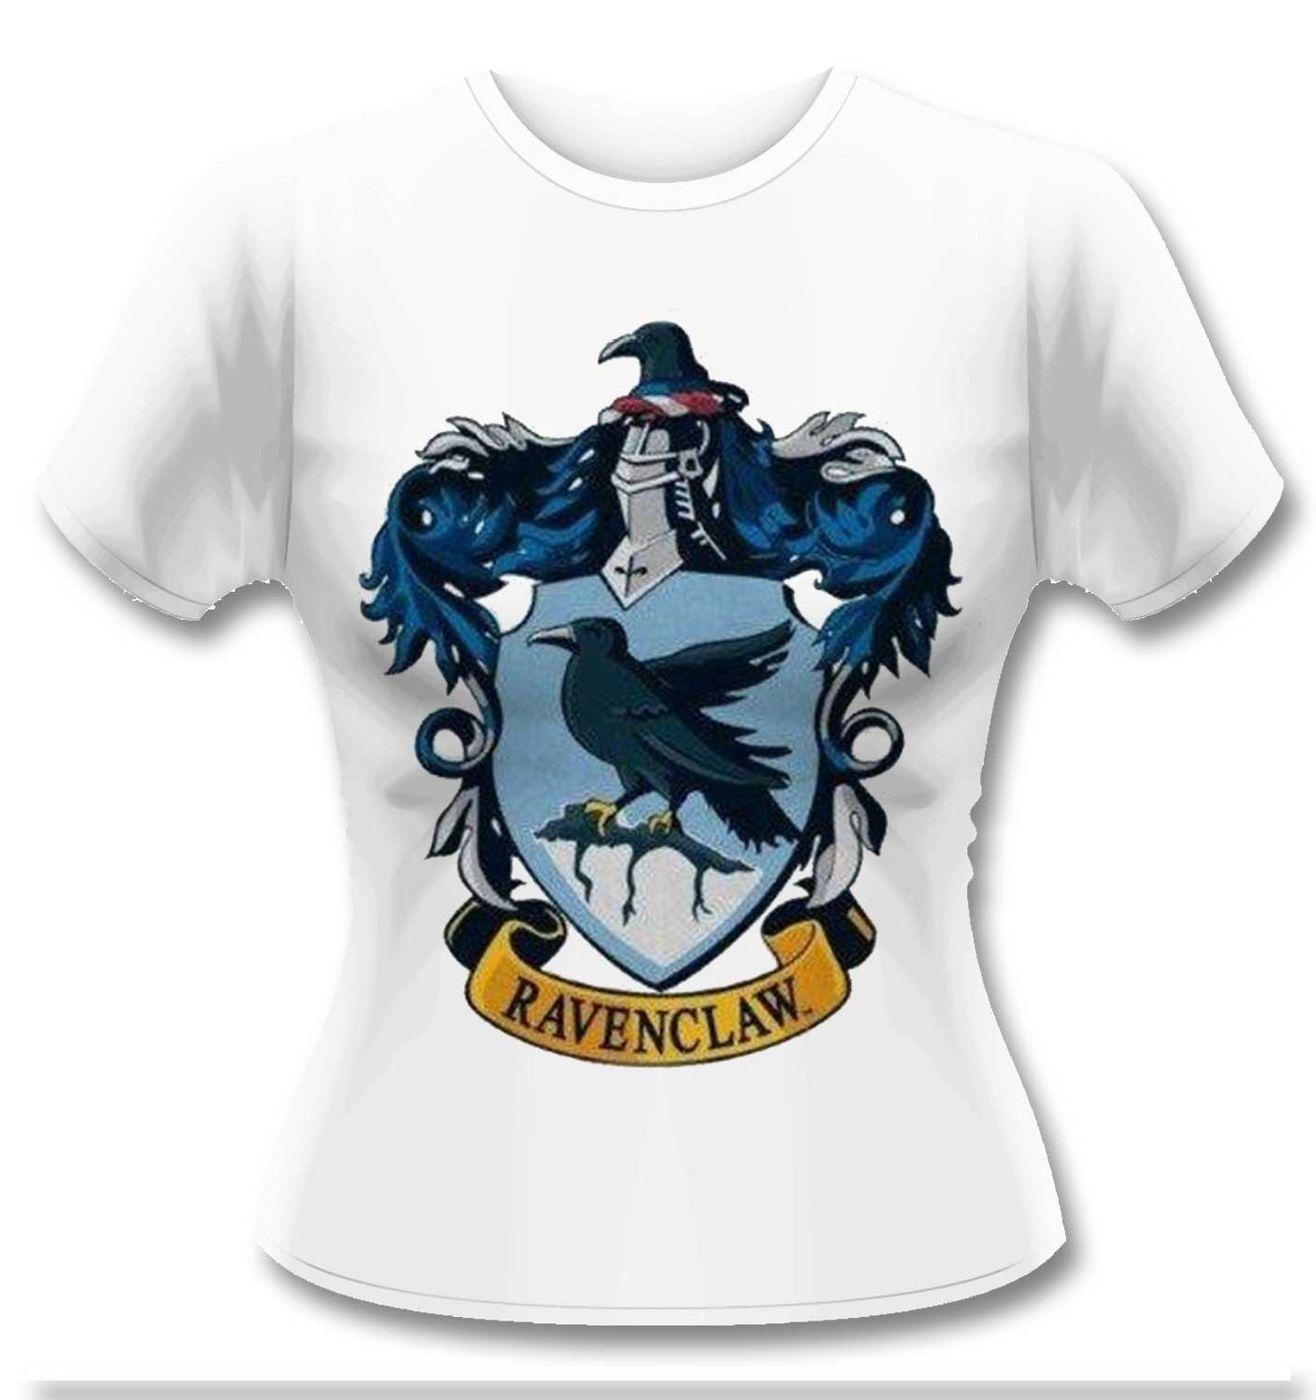 Ravenclaw women's t-shirt